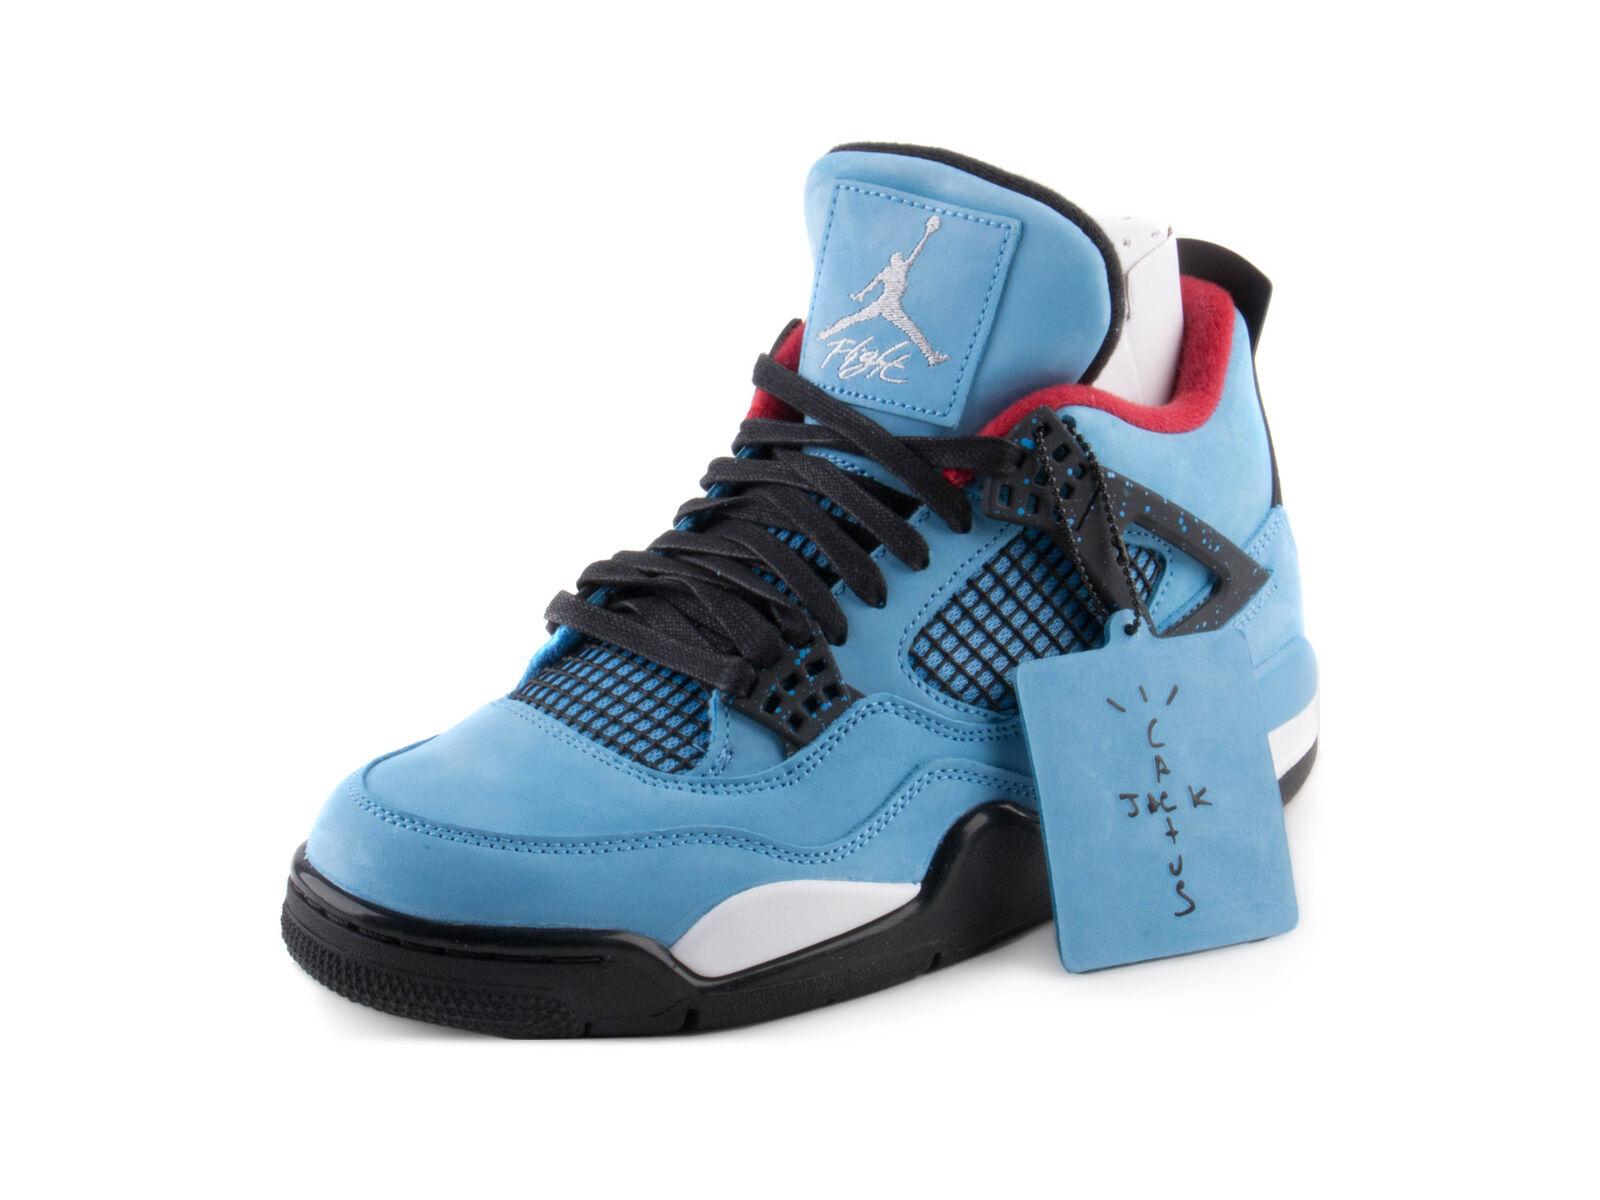 pretty nice b58ba 4b86b Air Jordan 4 Retro IV Cactus Jack Size 11 Travis Scott 308497 406 for sale  online   eBay